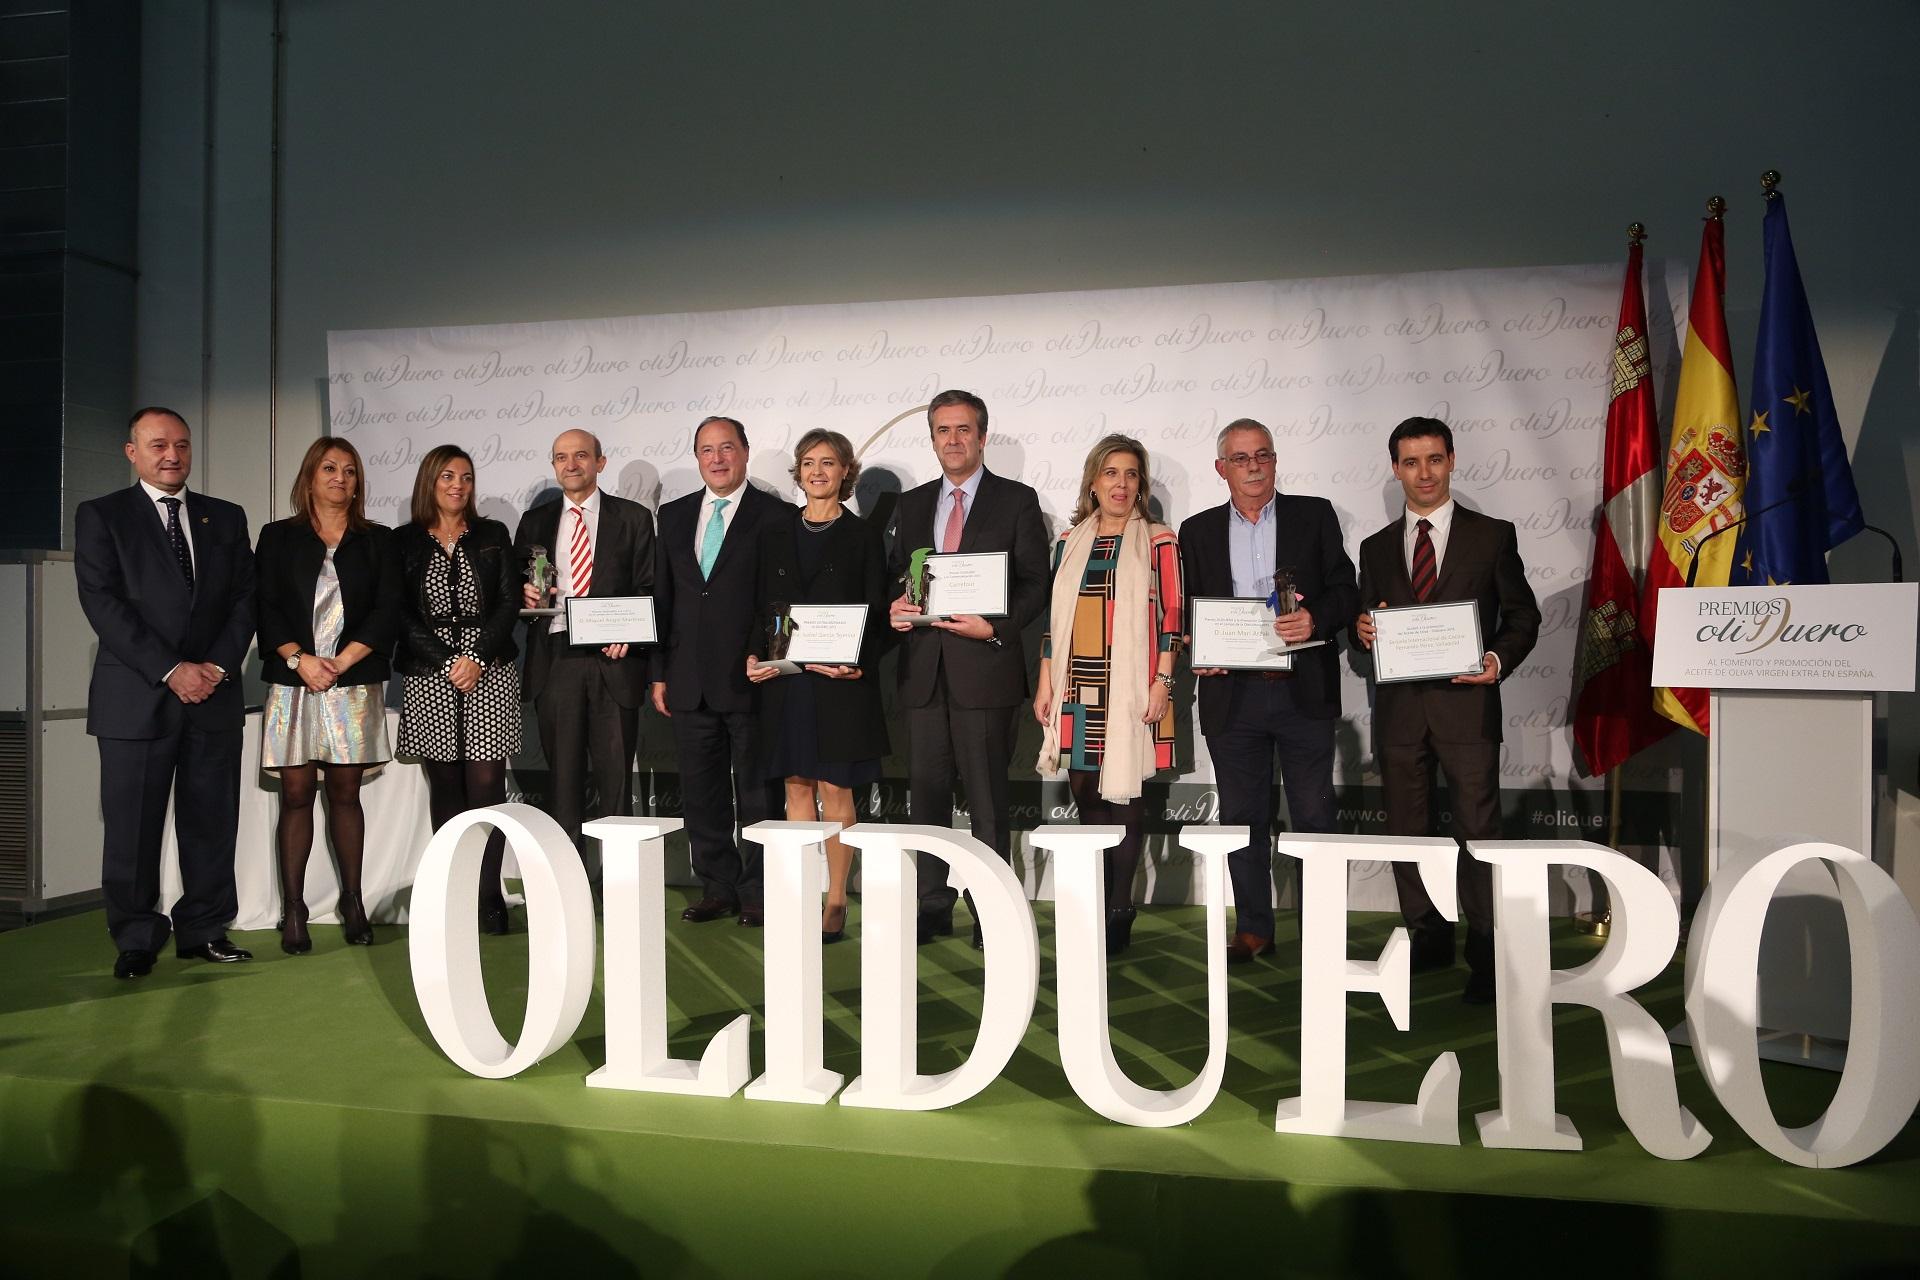 Premios Oliduero